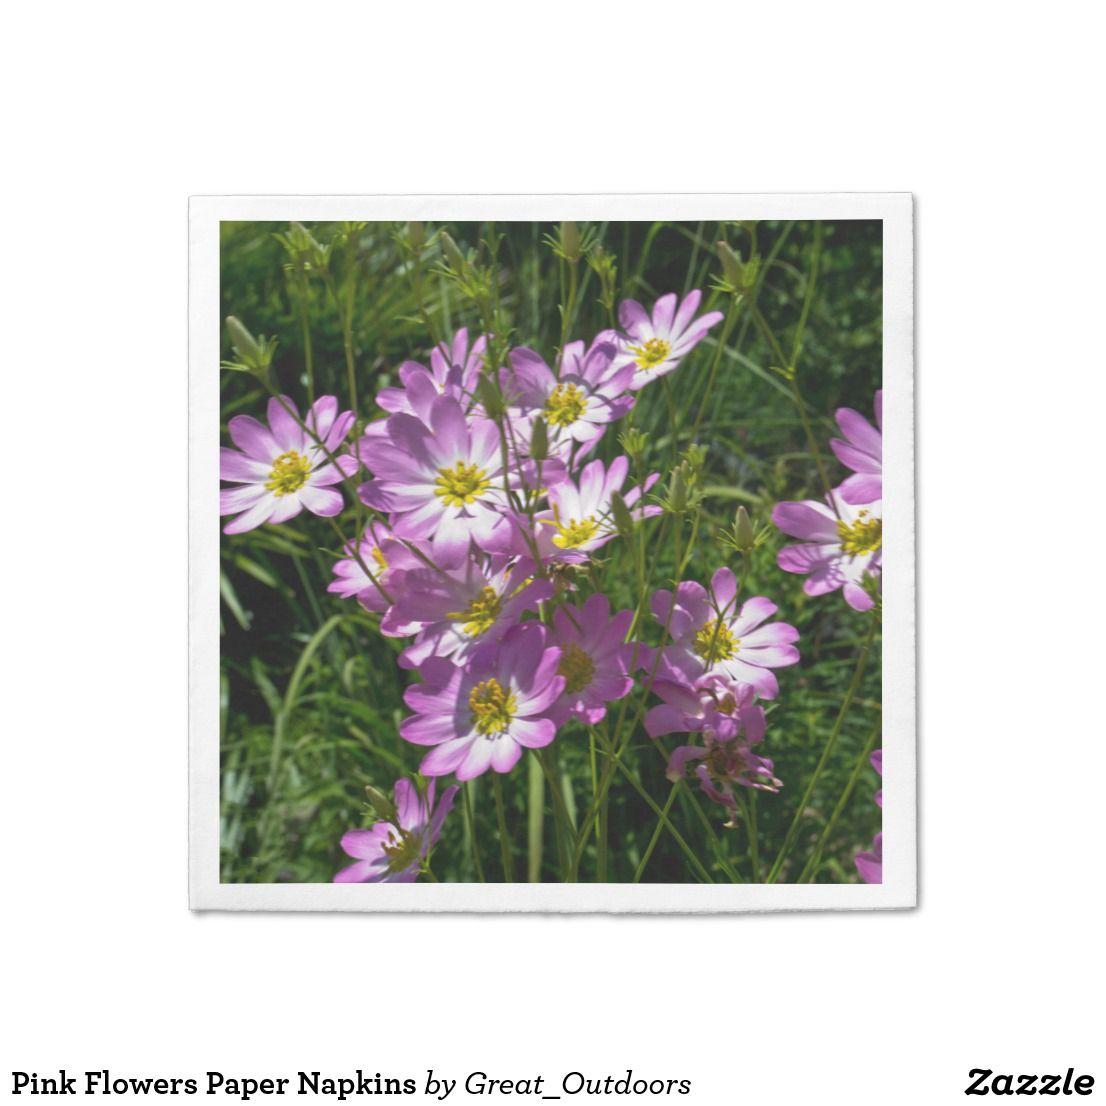 Pink Flowers Paper Napkins